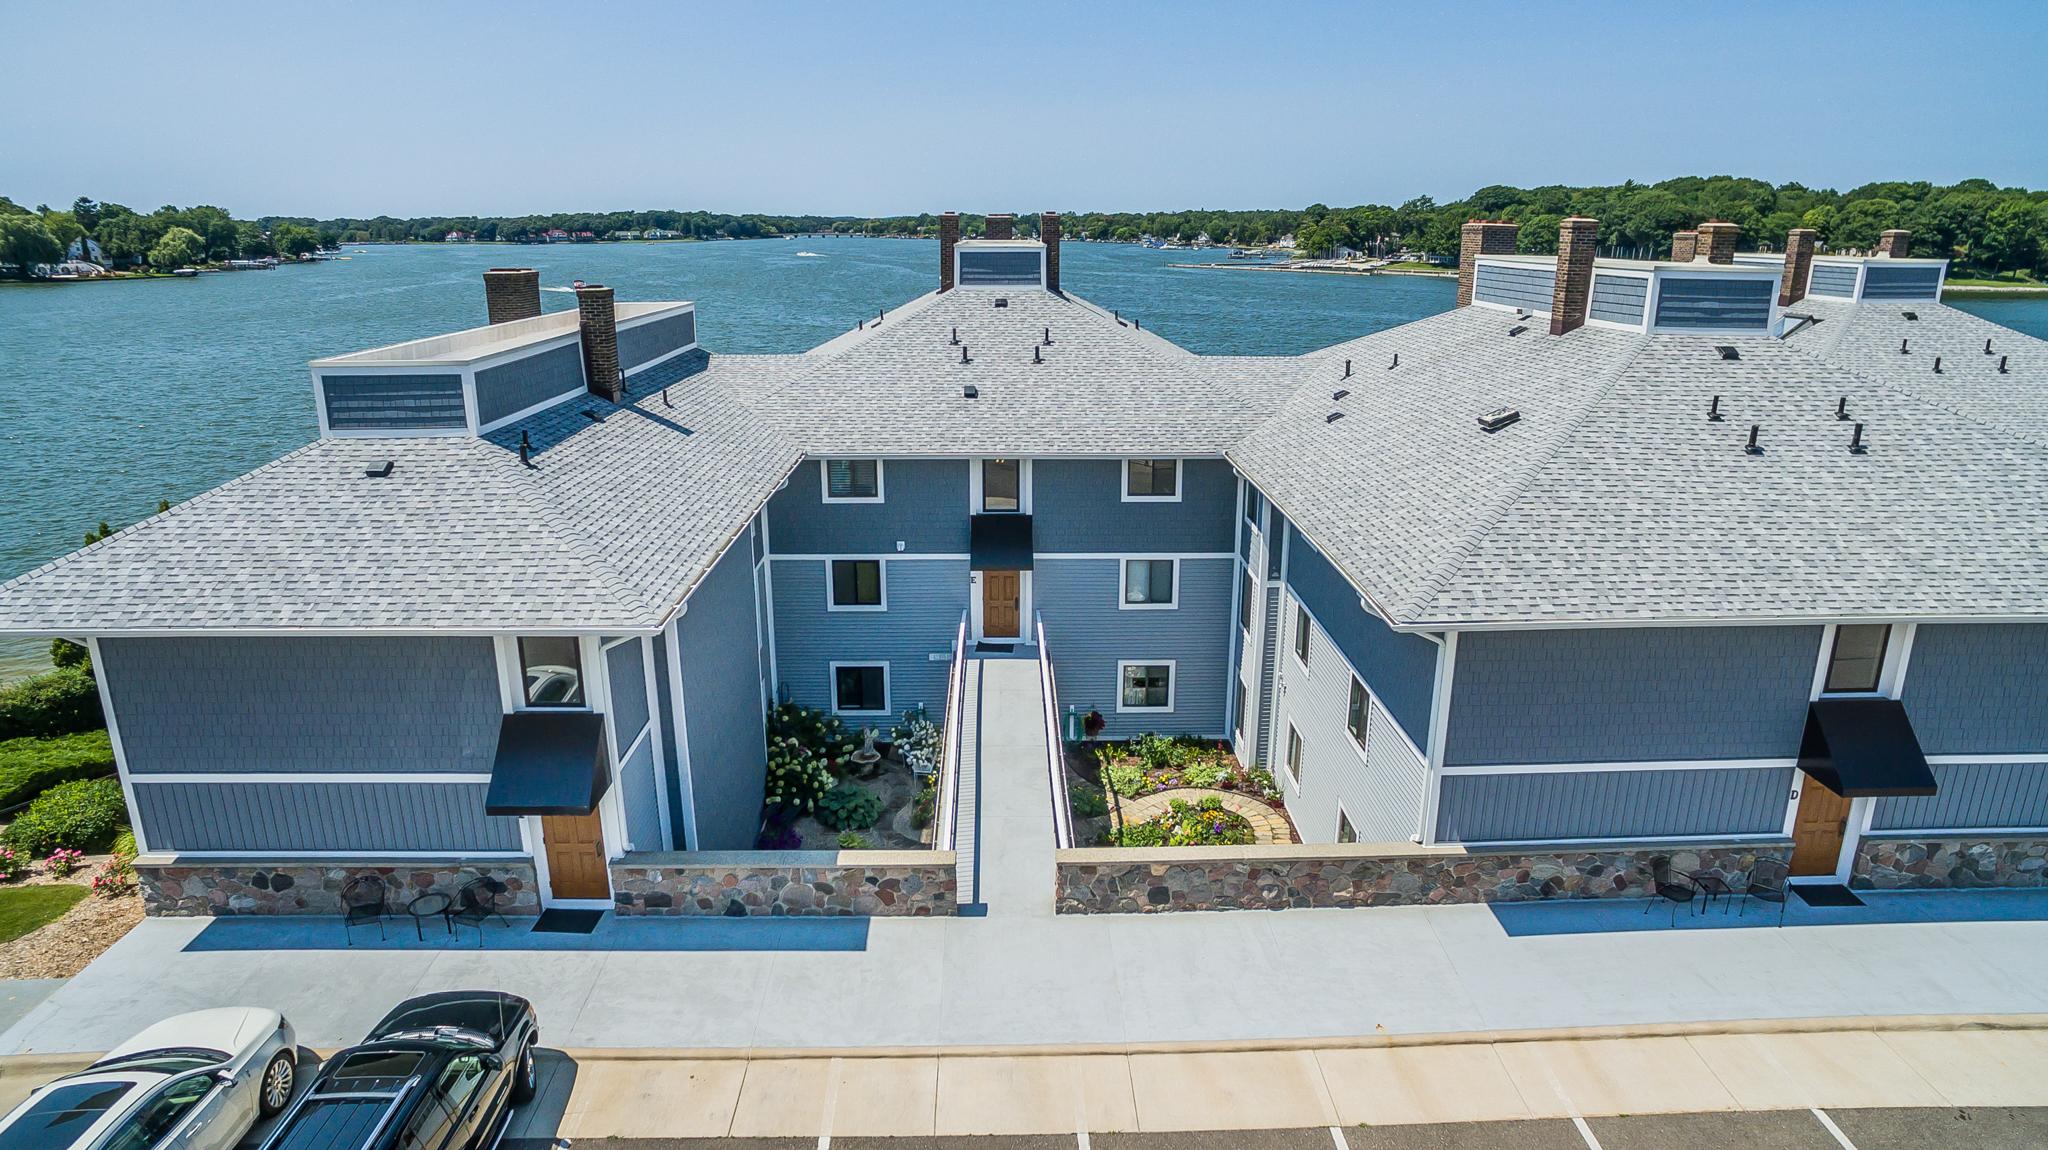 Nhà chung cư vì Bán tại Spacious Coastal Condominium 400 Lakeview Court Unit 31 E Spring Lake, Michigan, 49456 Hoa Kỳ